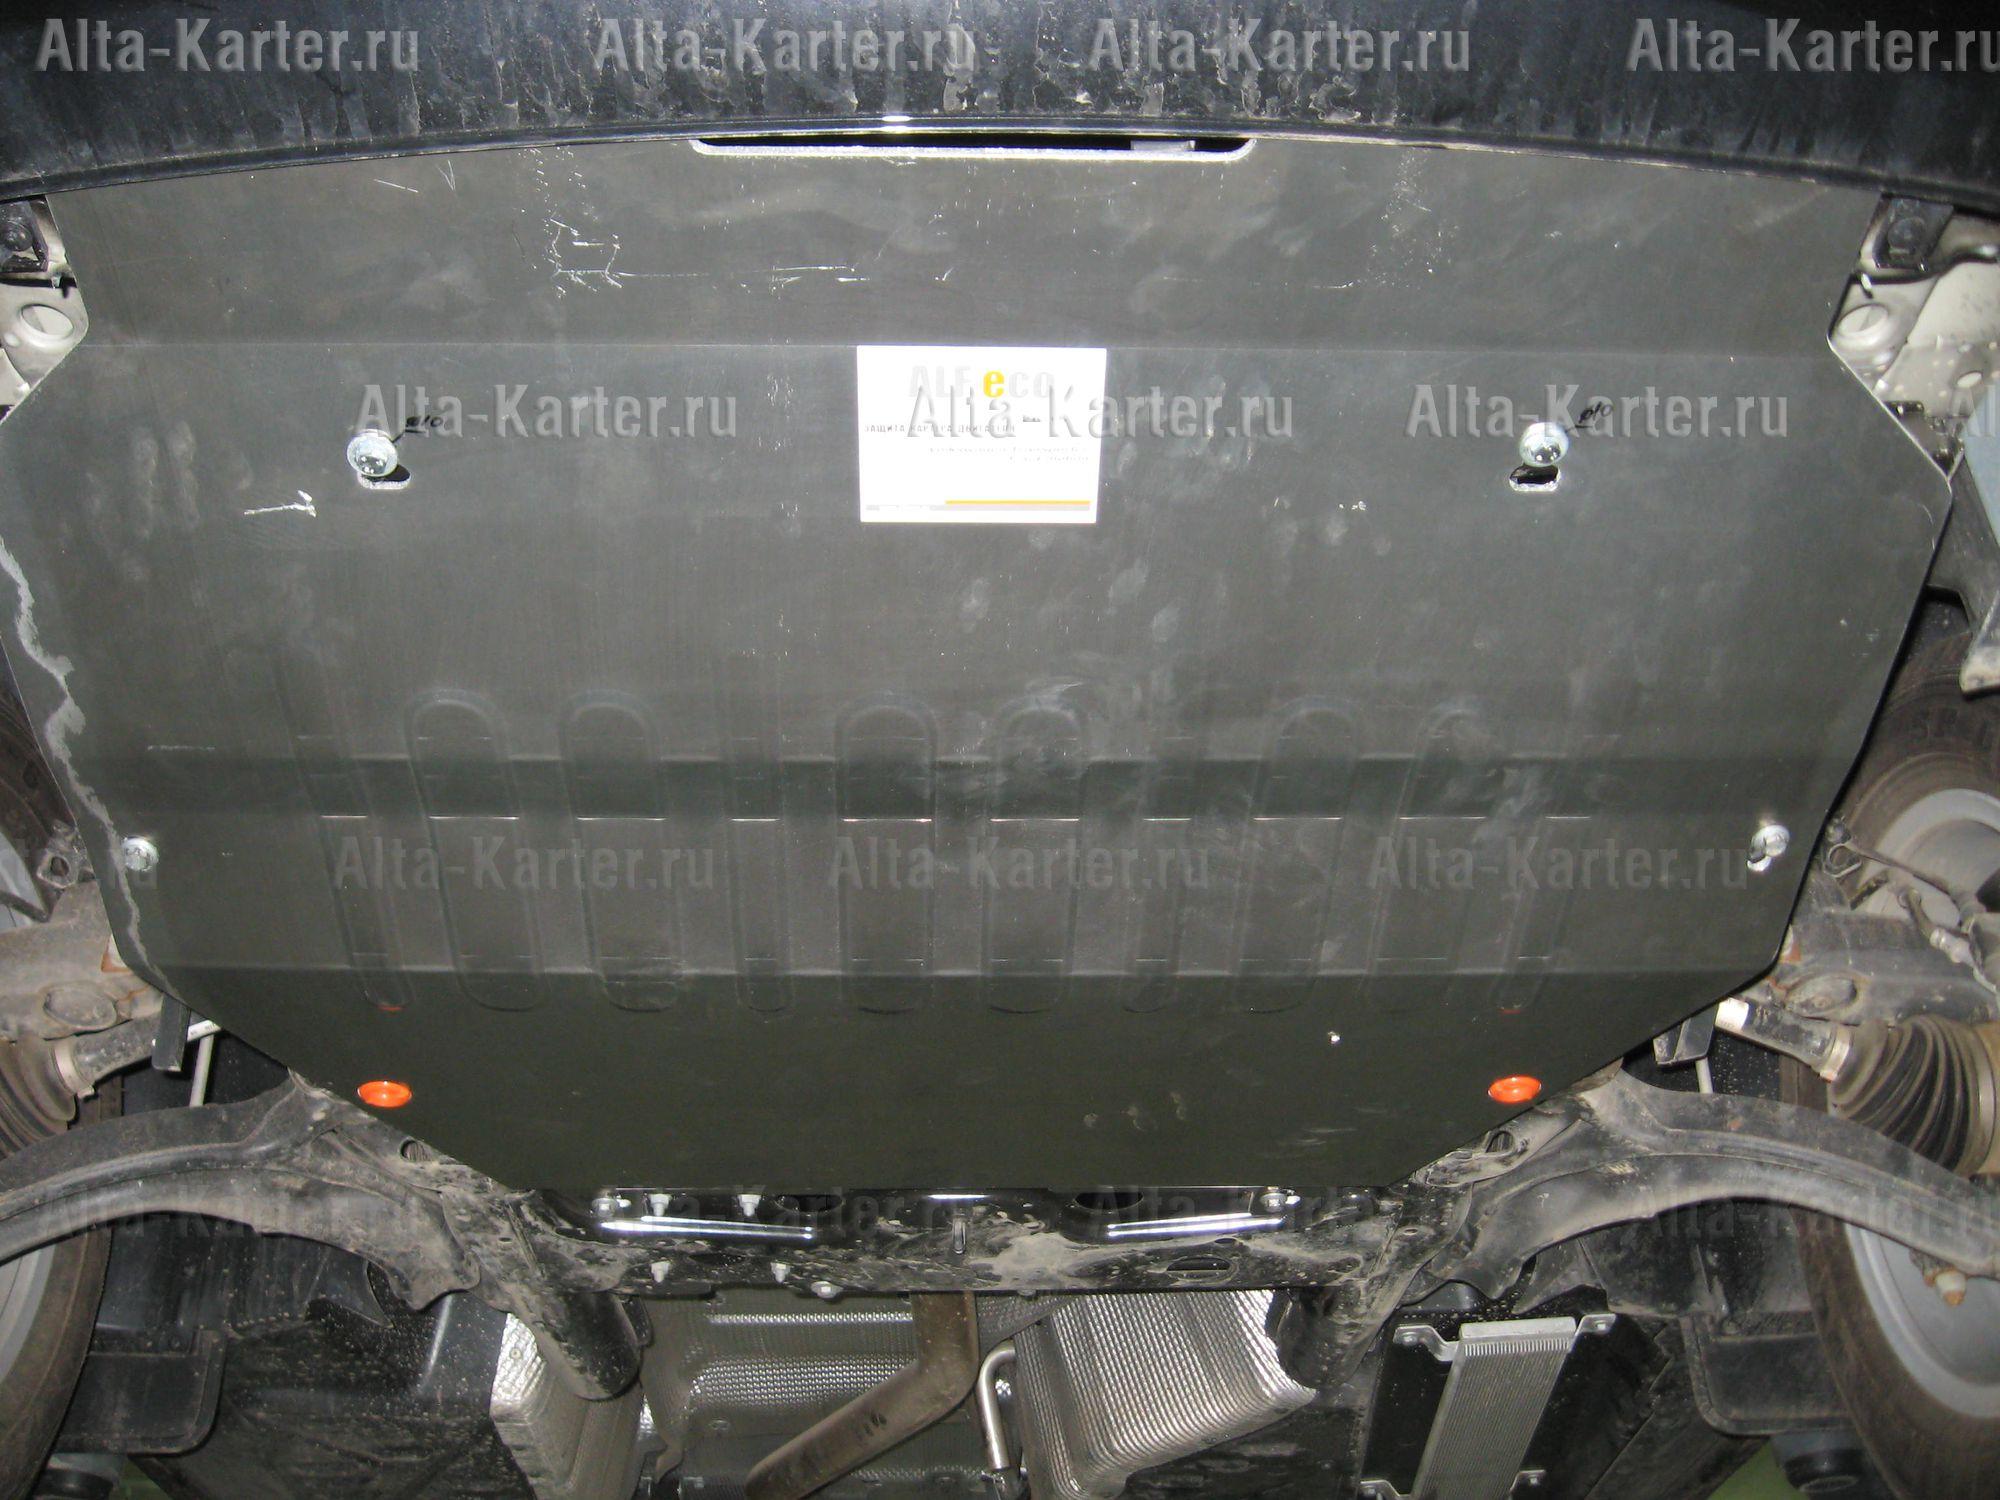 Защита Alfeco для картера и КПП Volkswagen Transporter T5 4Motion 2003-2015. Артикул ALF.26.23